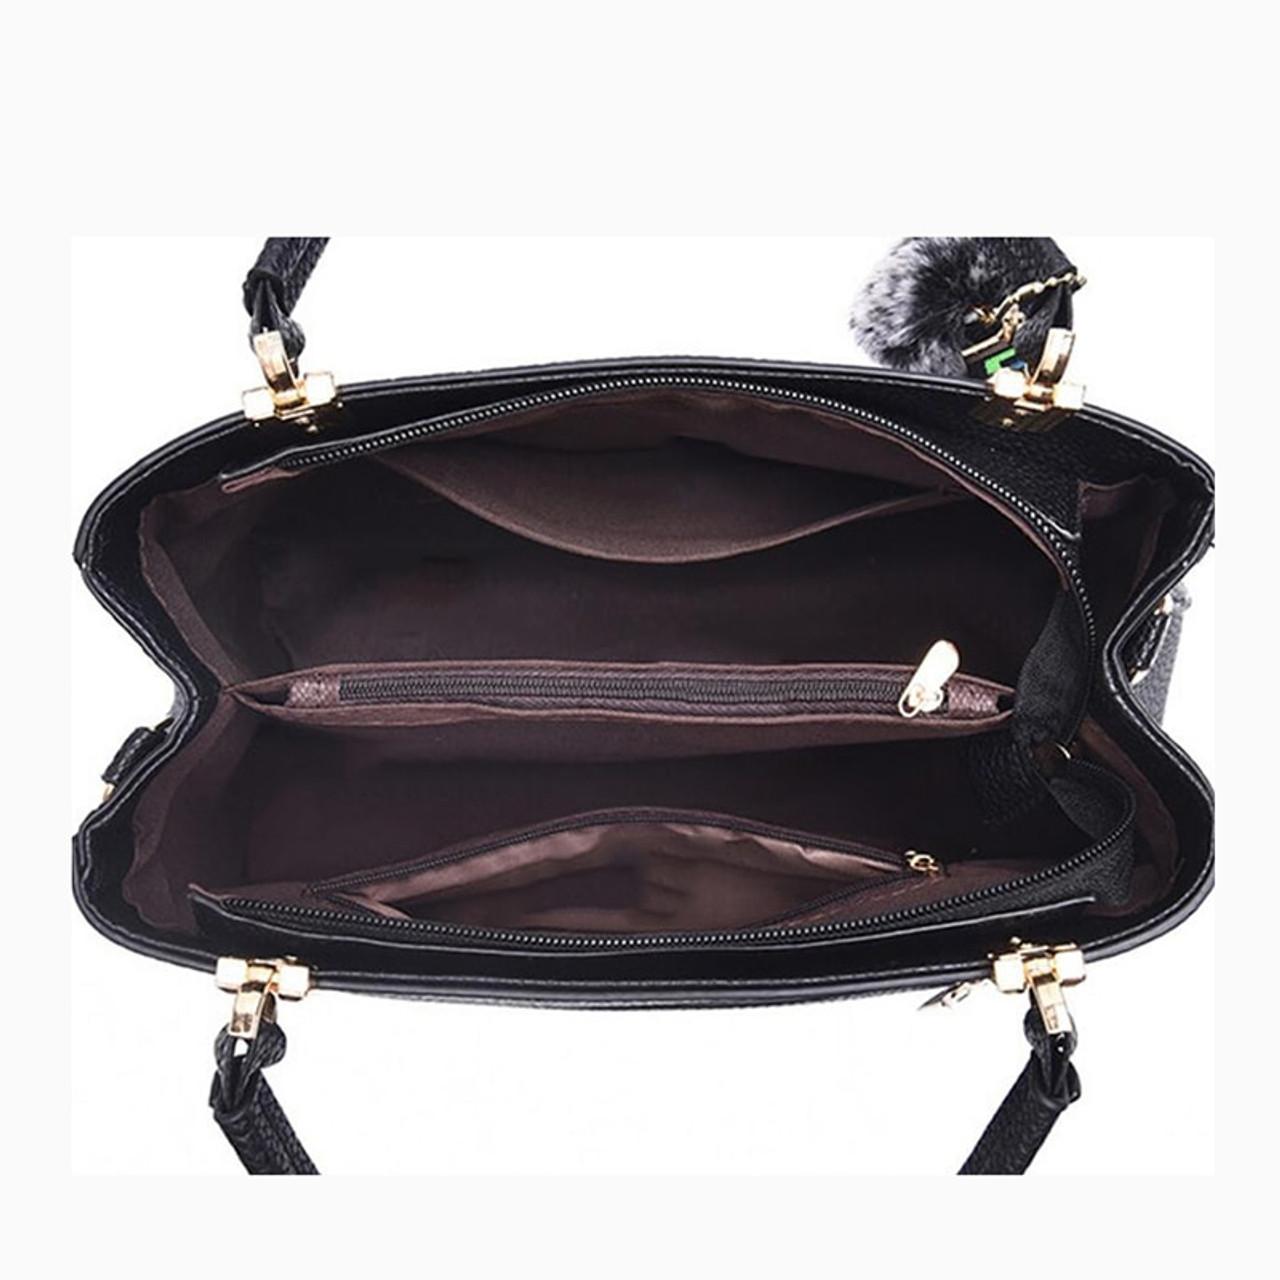 0e8391a1b5a3c ... Women Bag Vintage Messenger Bags Shoulder Handbag Women Top-Handle  Leather Imitation Pattern Composite Bag ...